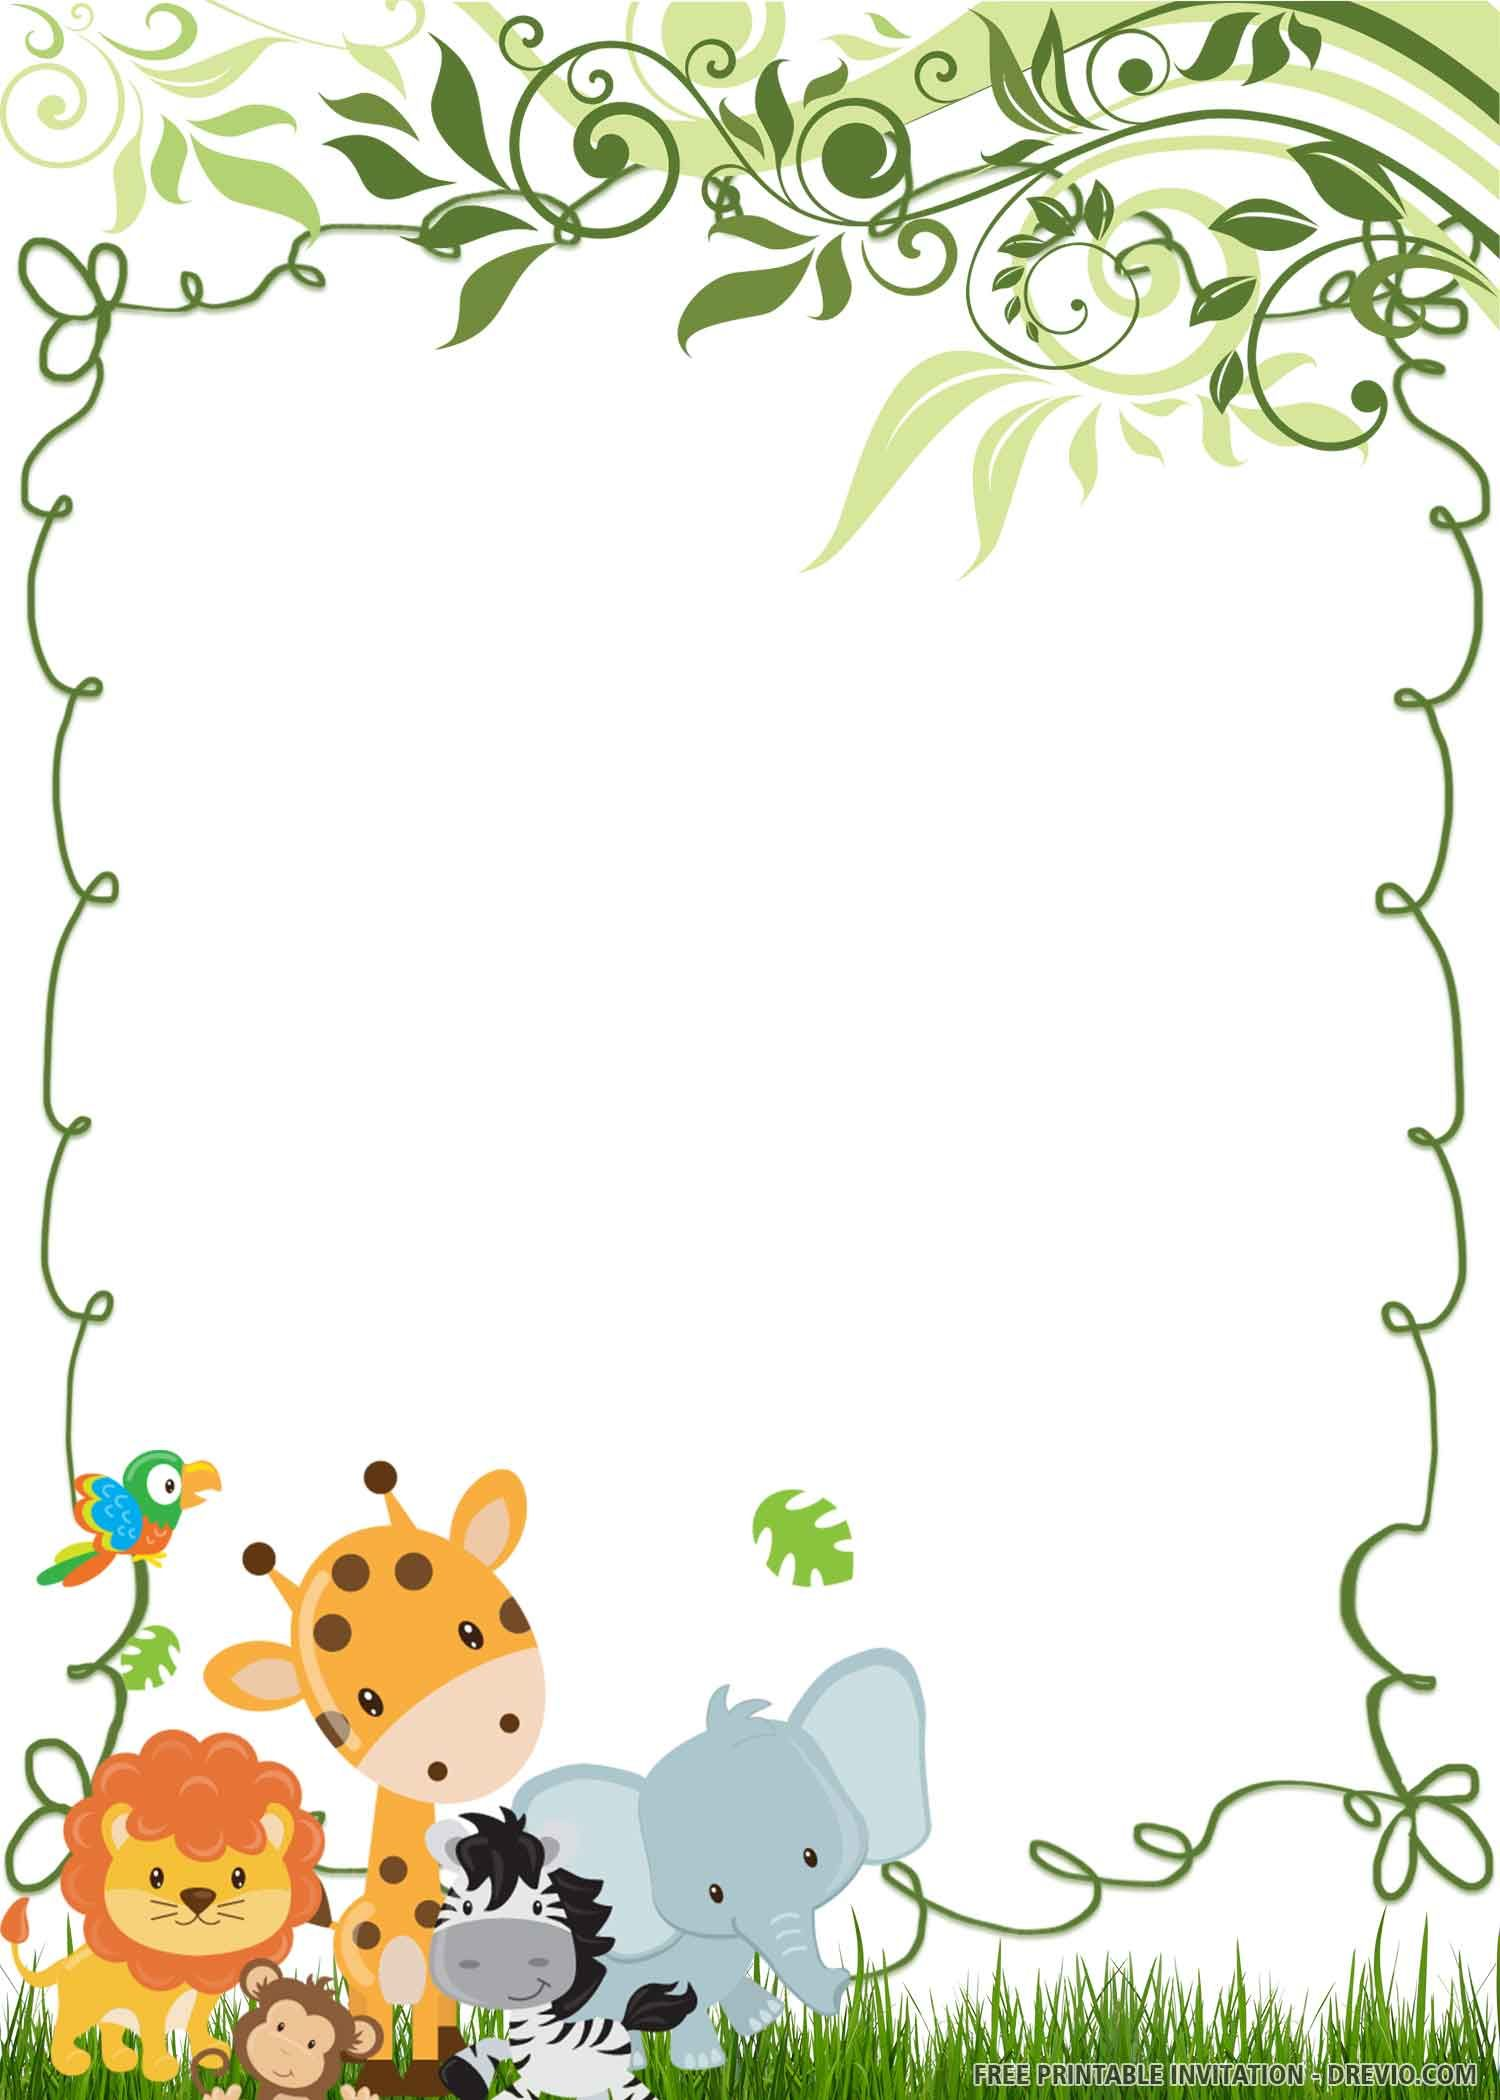 Free Printable Wild One Birthday Invitation Templates Wild One Birthday Invitations First Birthday Invitations Baby Birthday Invitations